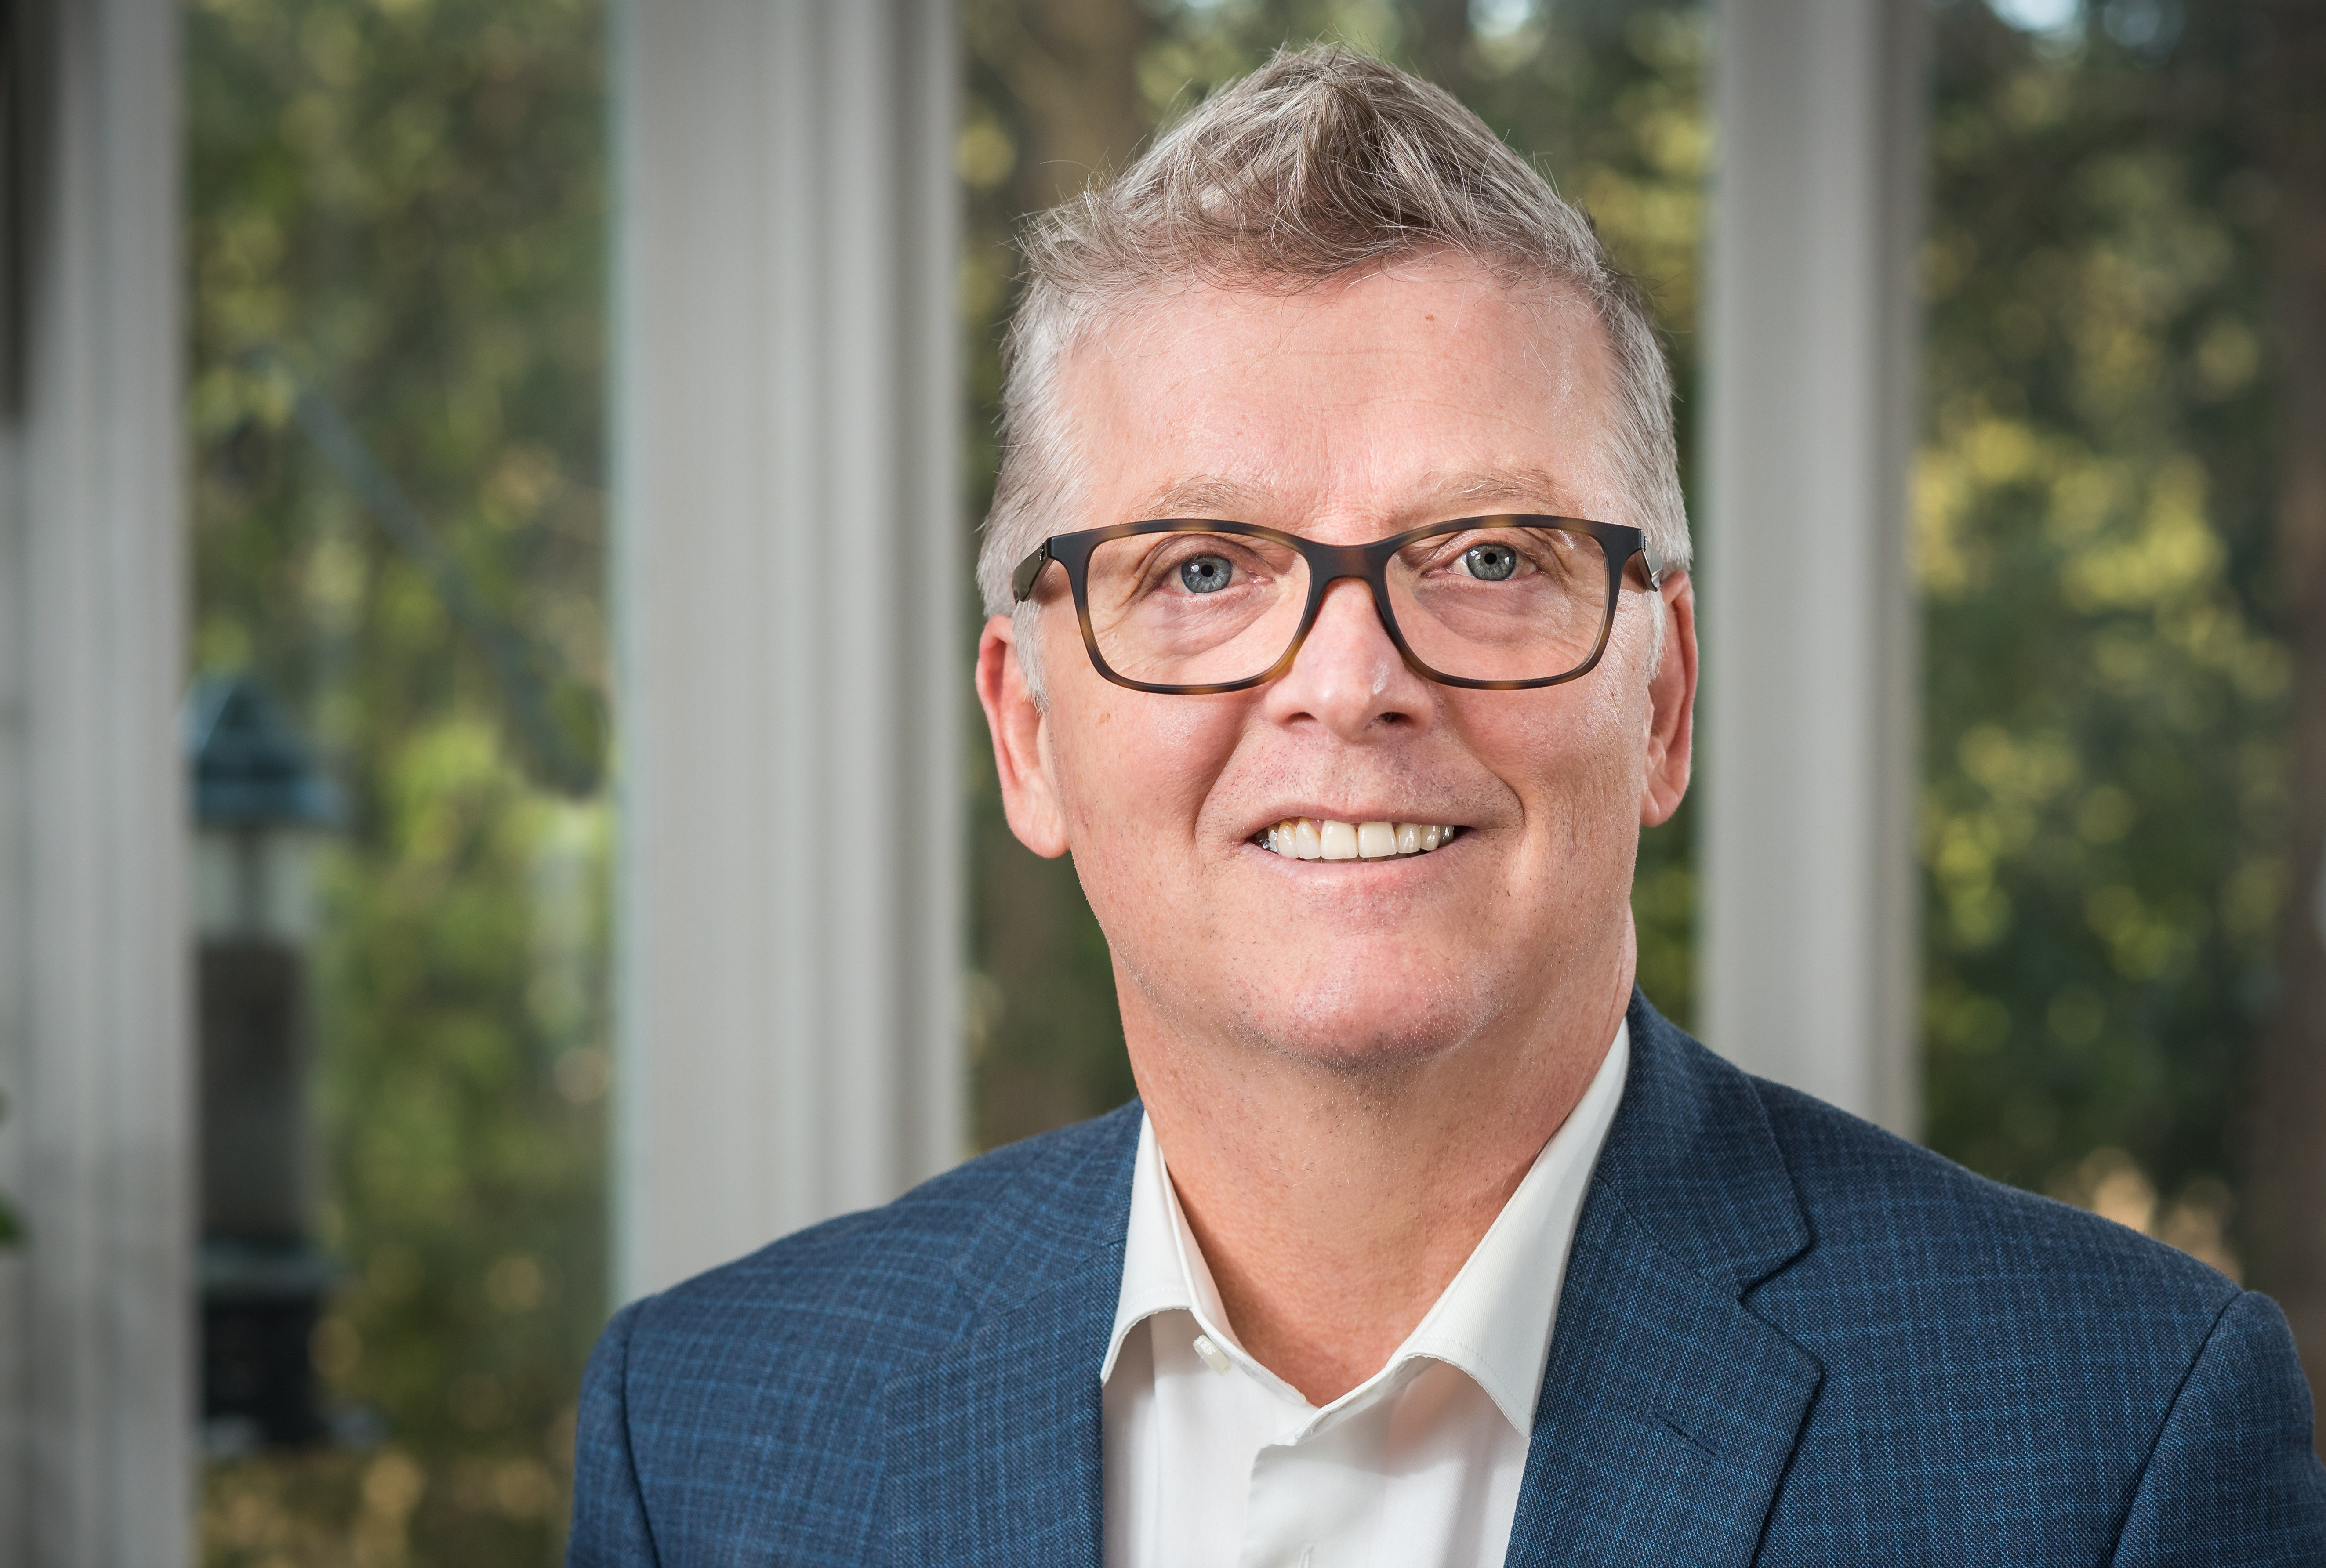 Mike MacKay of DeSpray Environmental